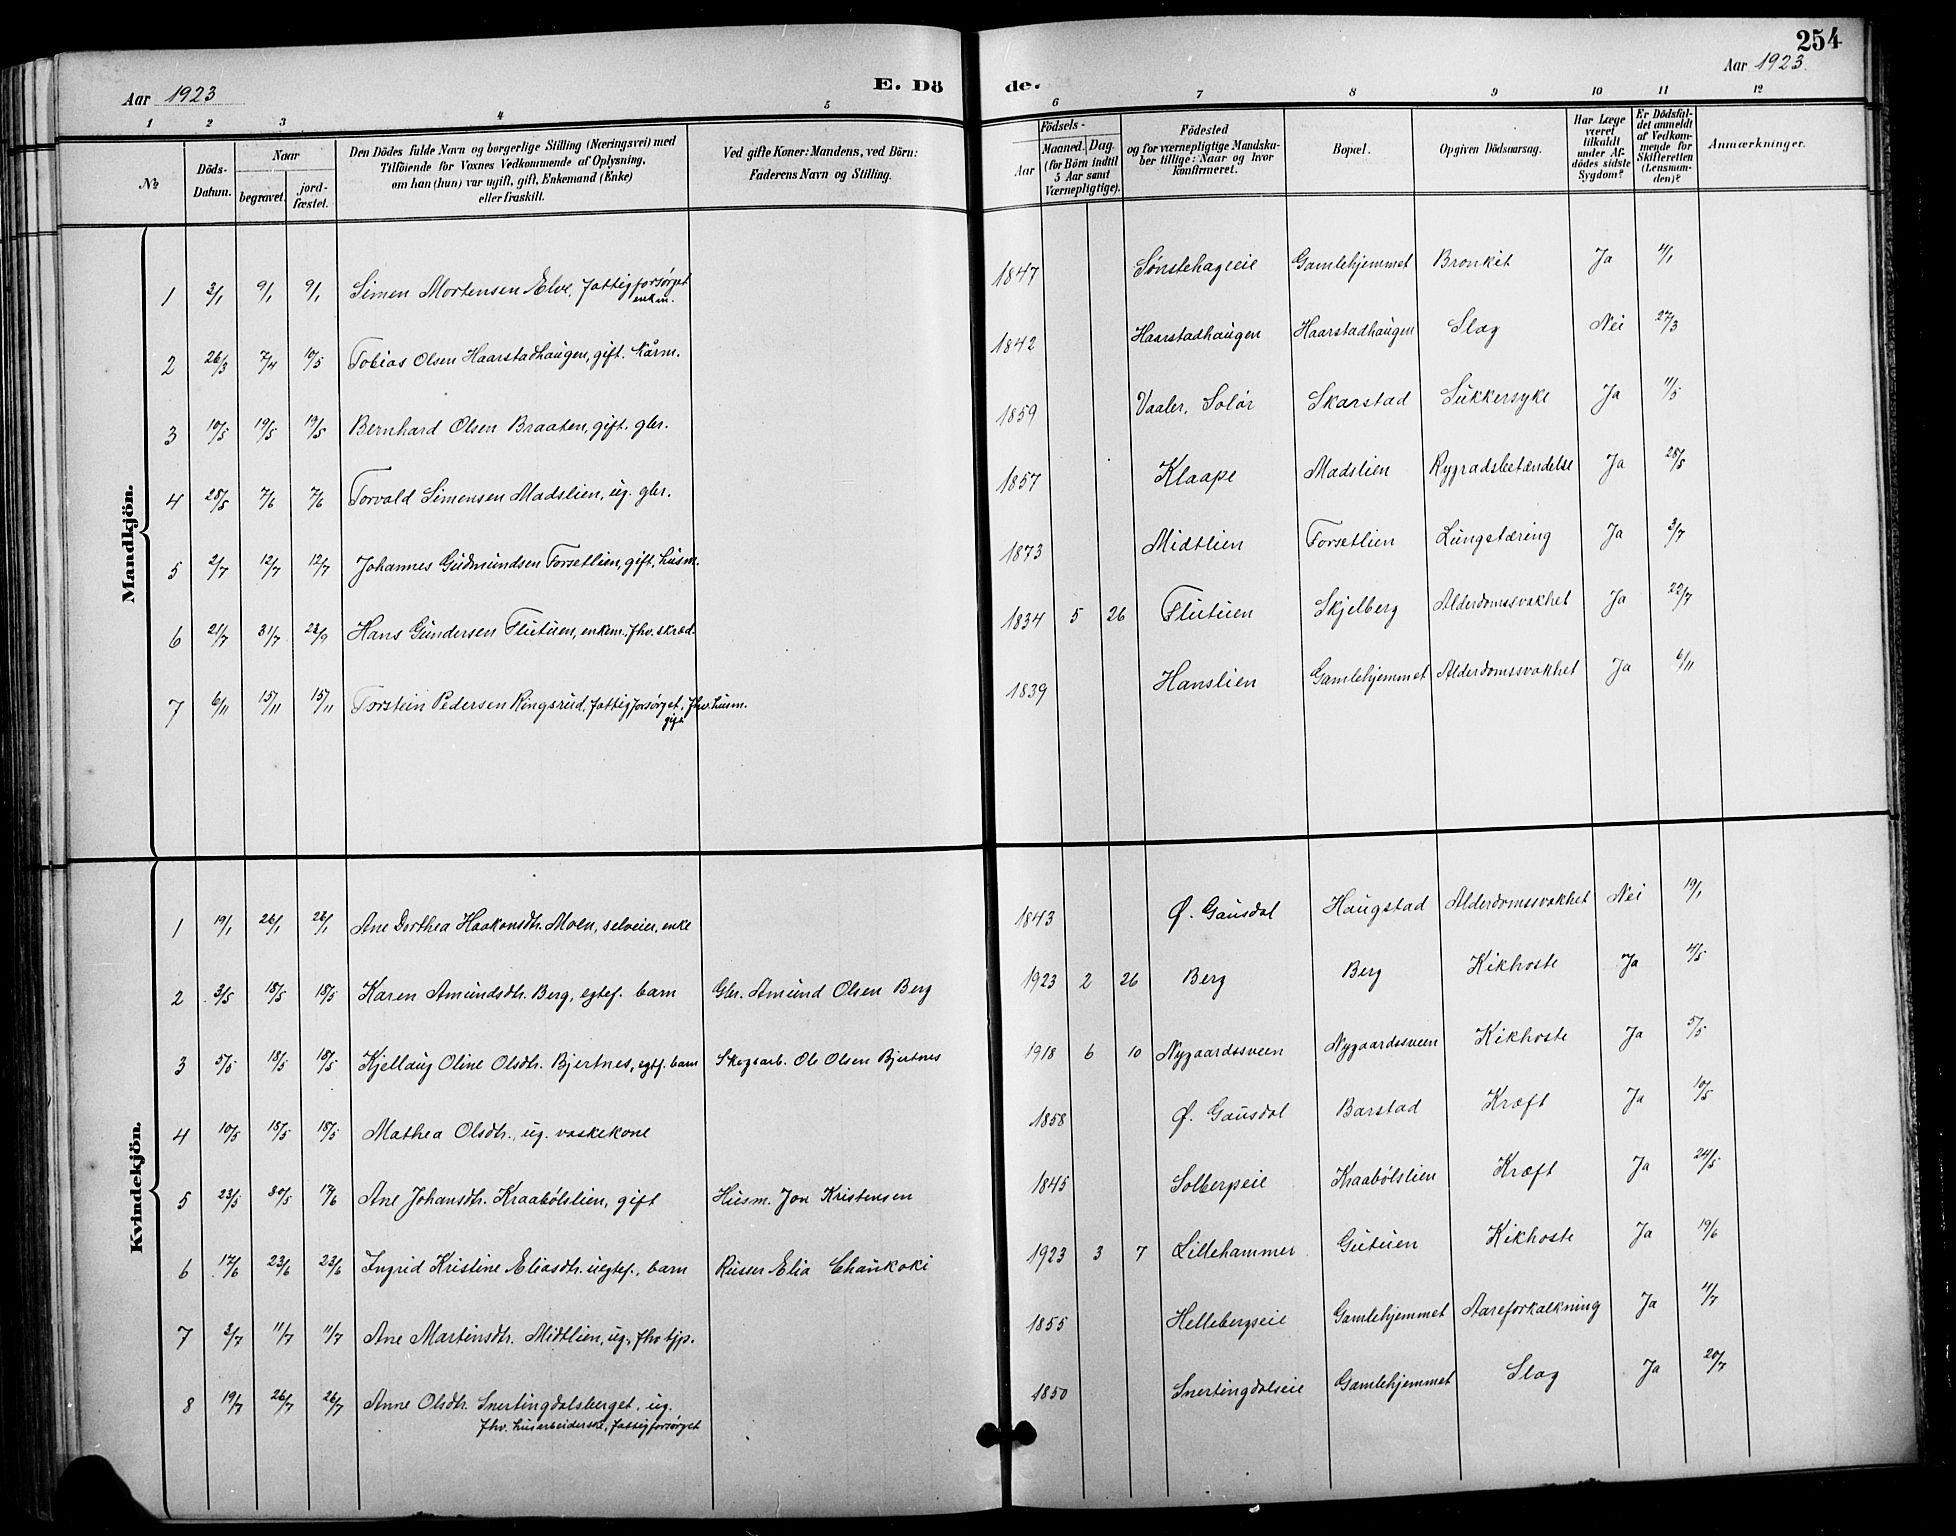 SAH, Vestre Gausdal prestekontor, Klokkerbok nr. 3, 1896-1925, s. 254